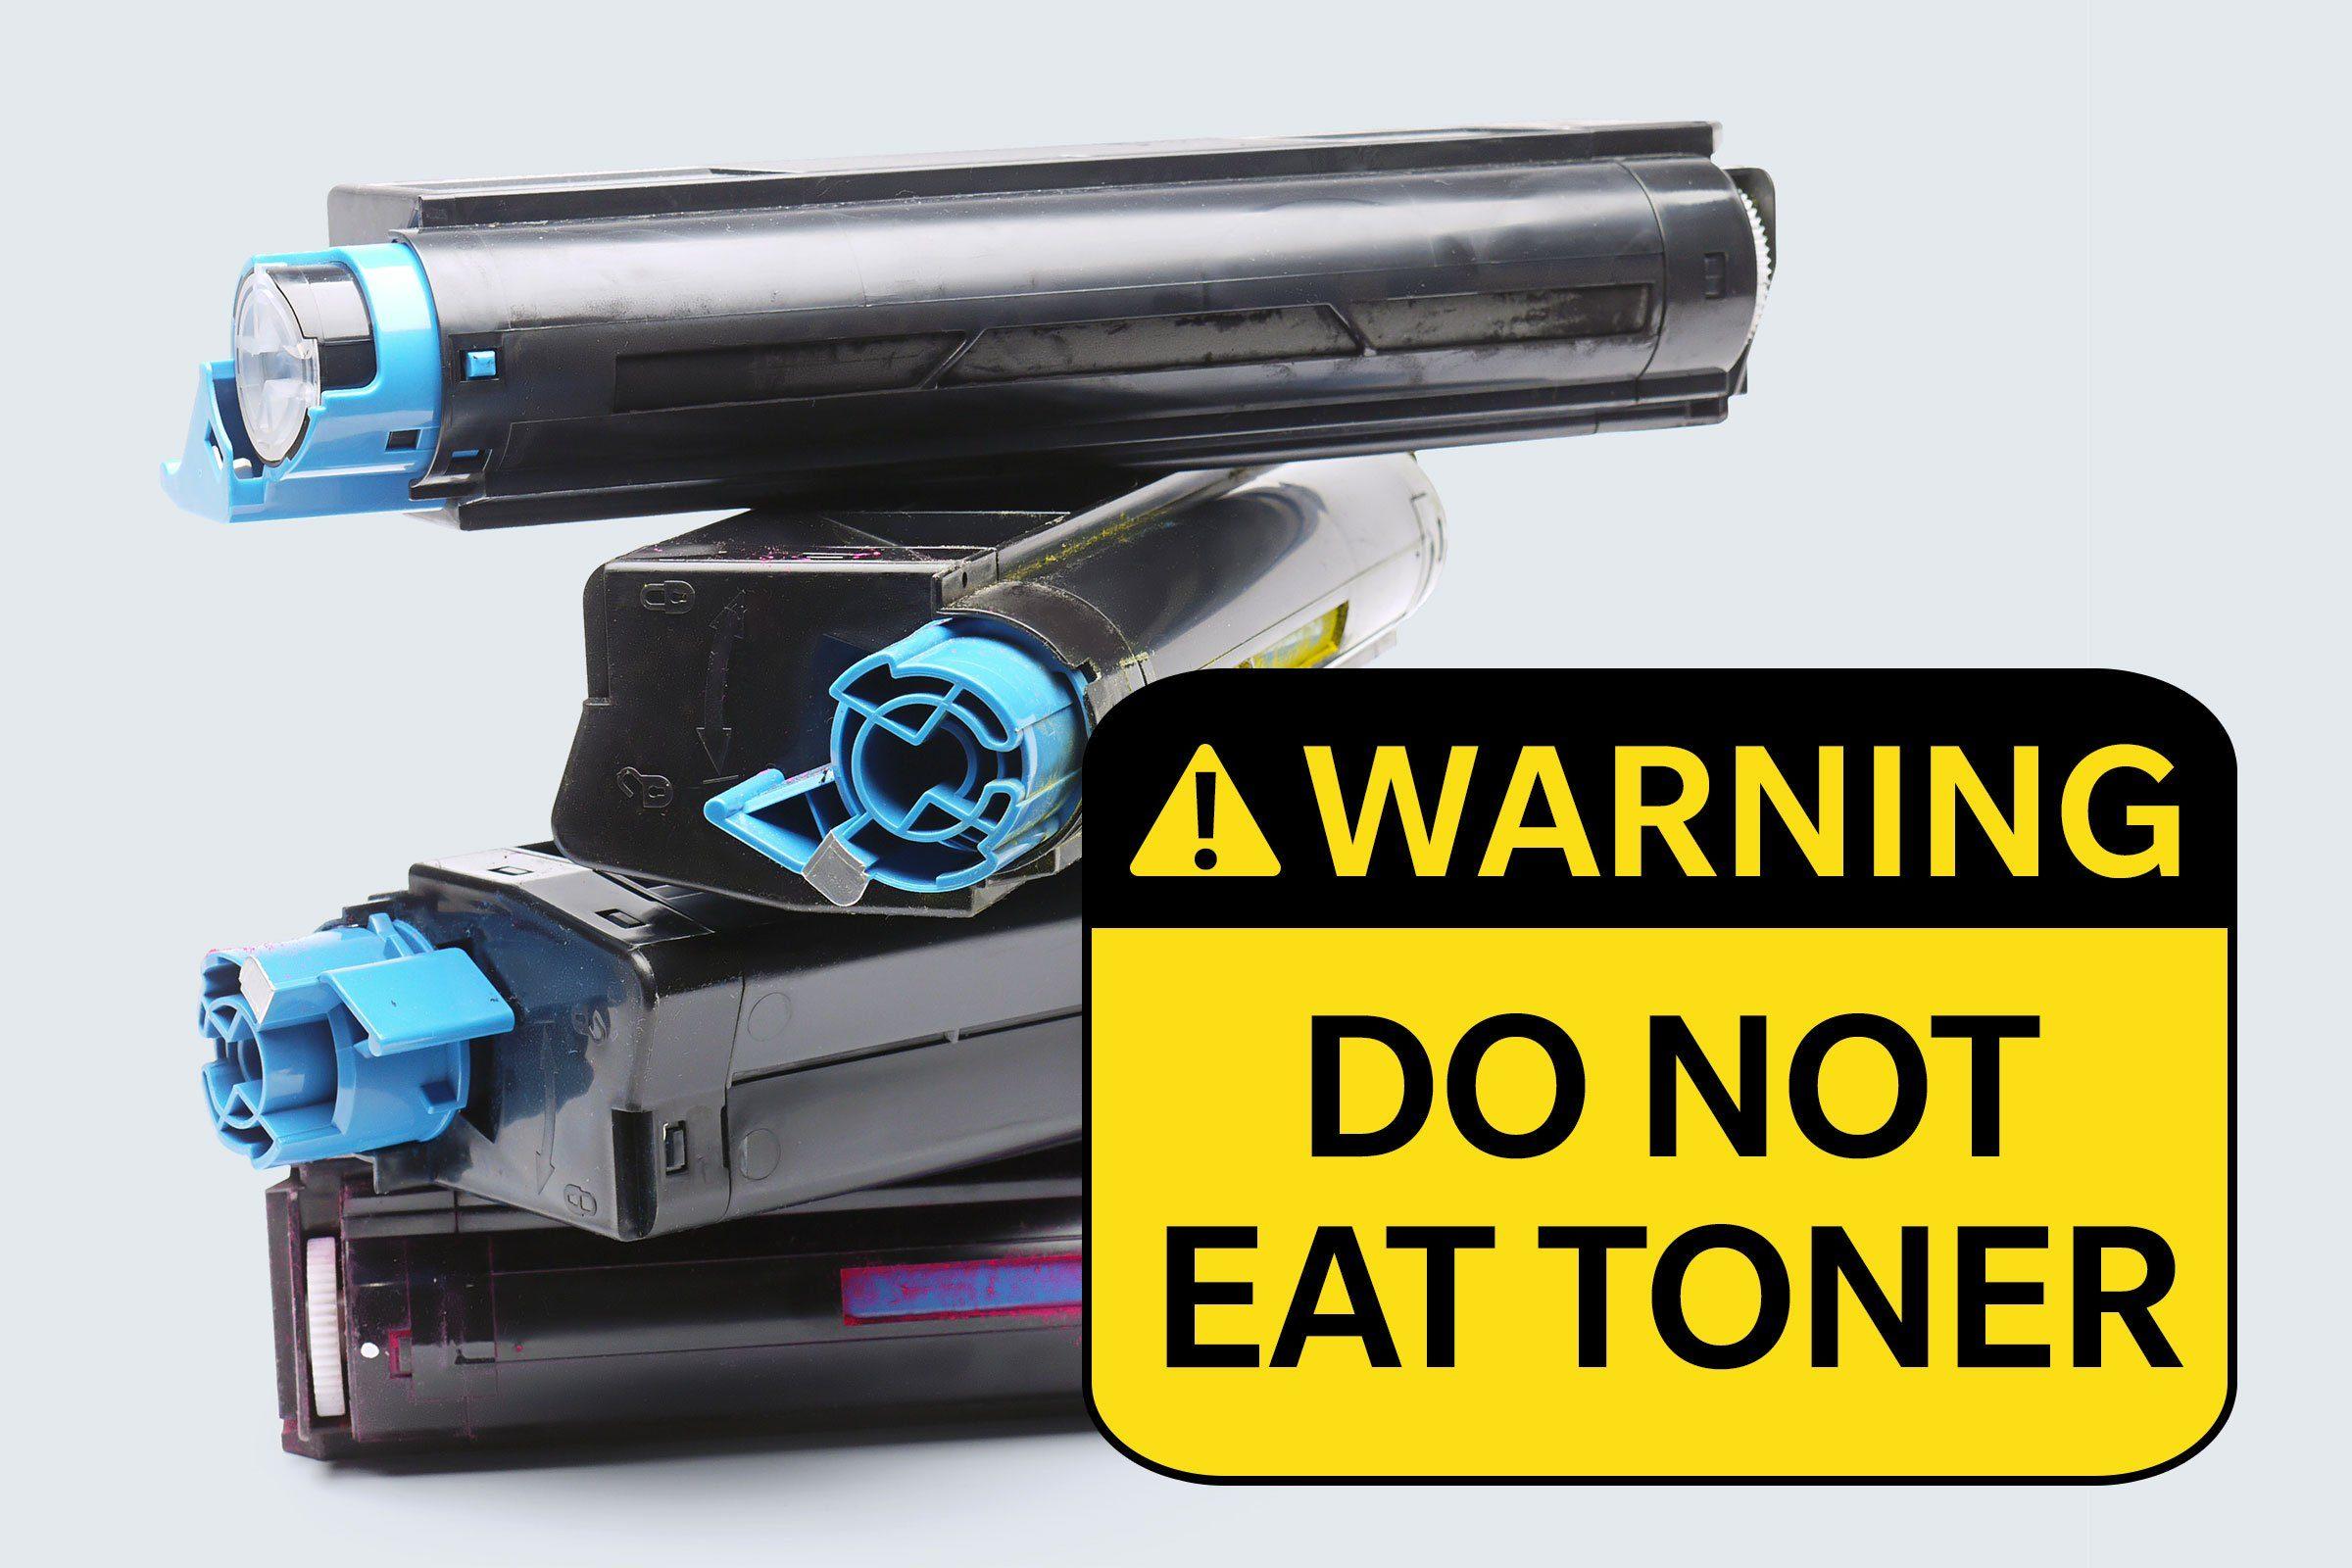 toner cartridges. warning: do not eat toner